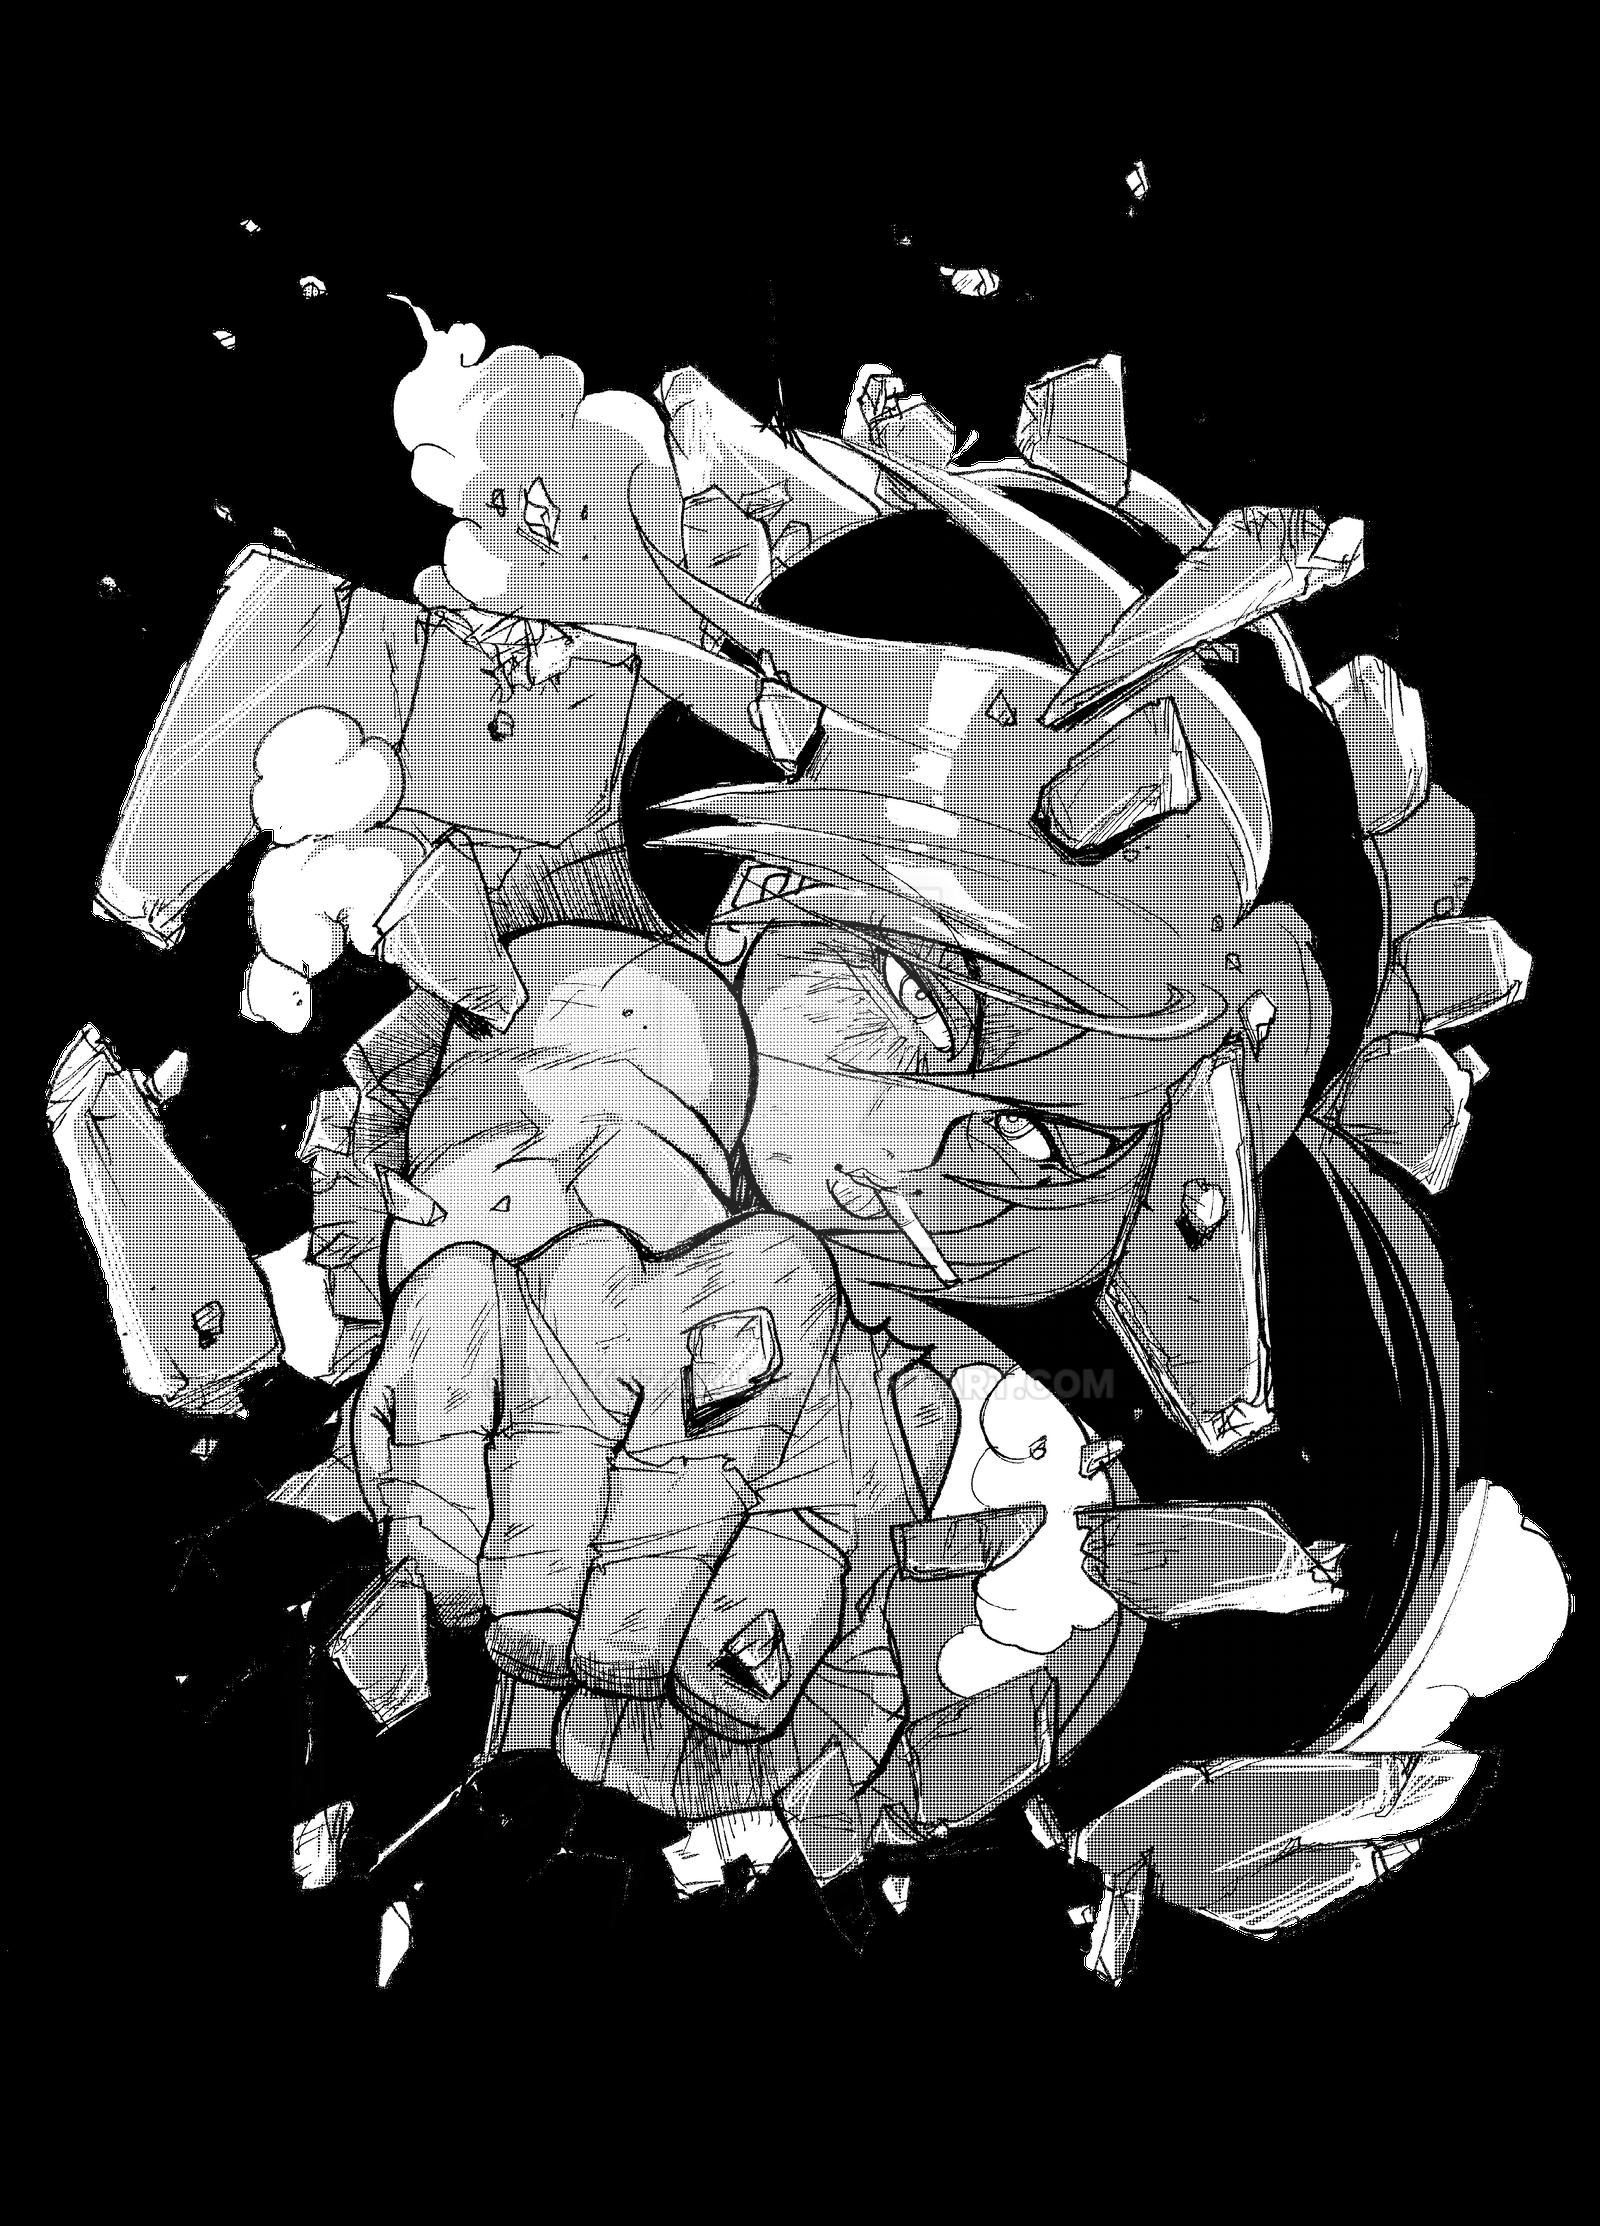 MaKuZoKu's Profile Picture